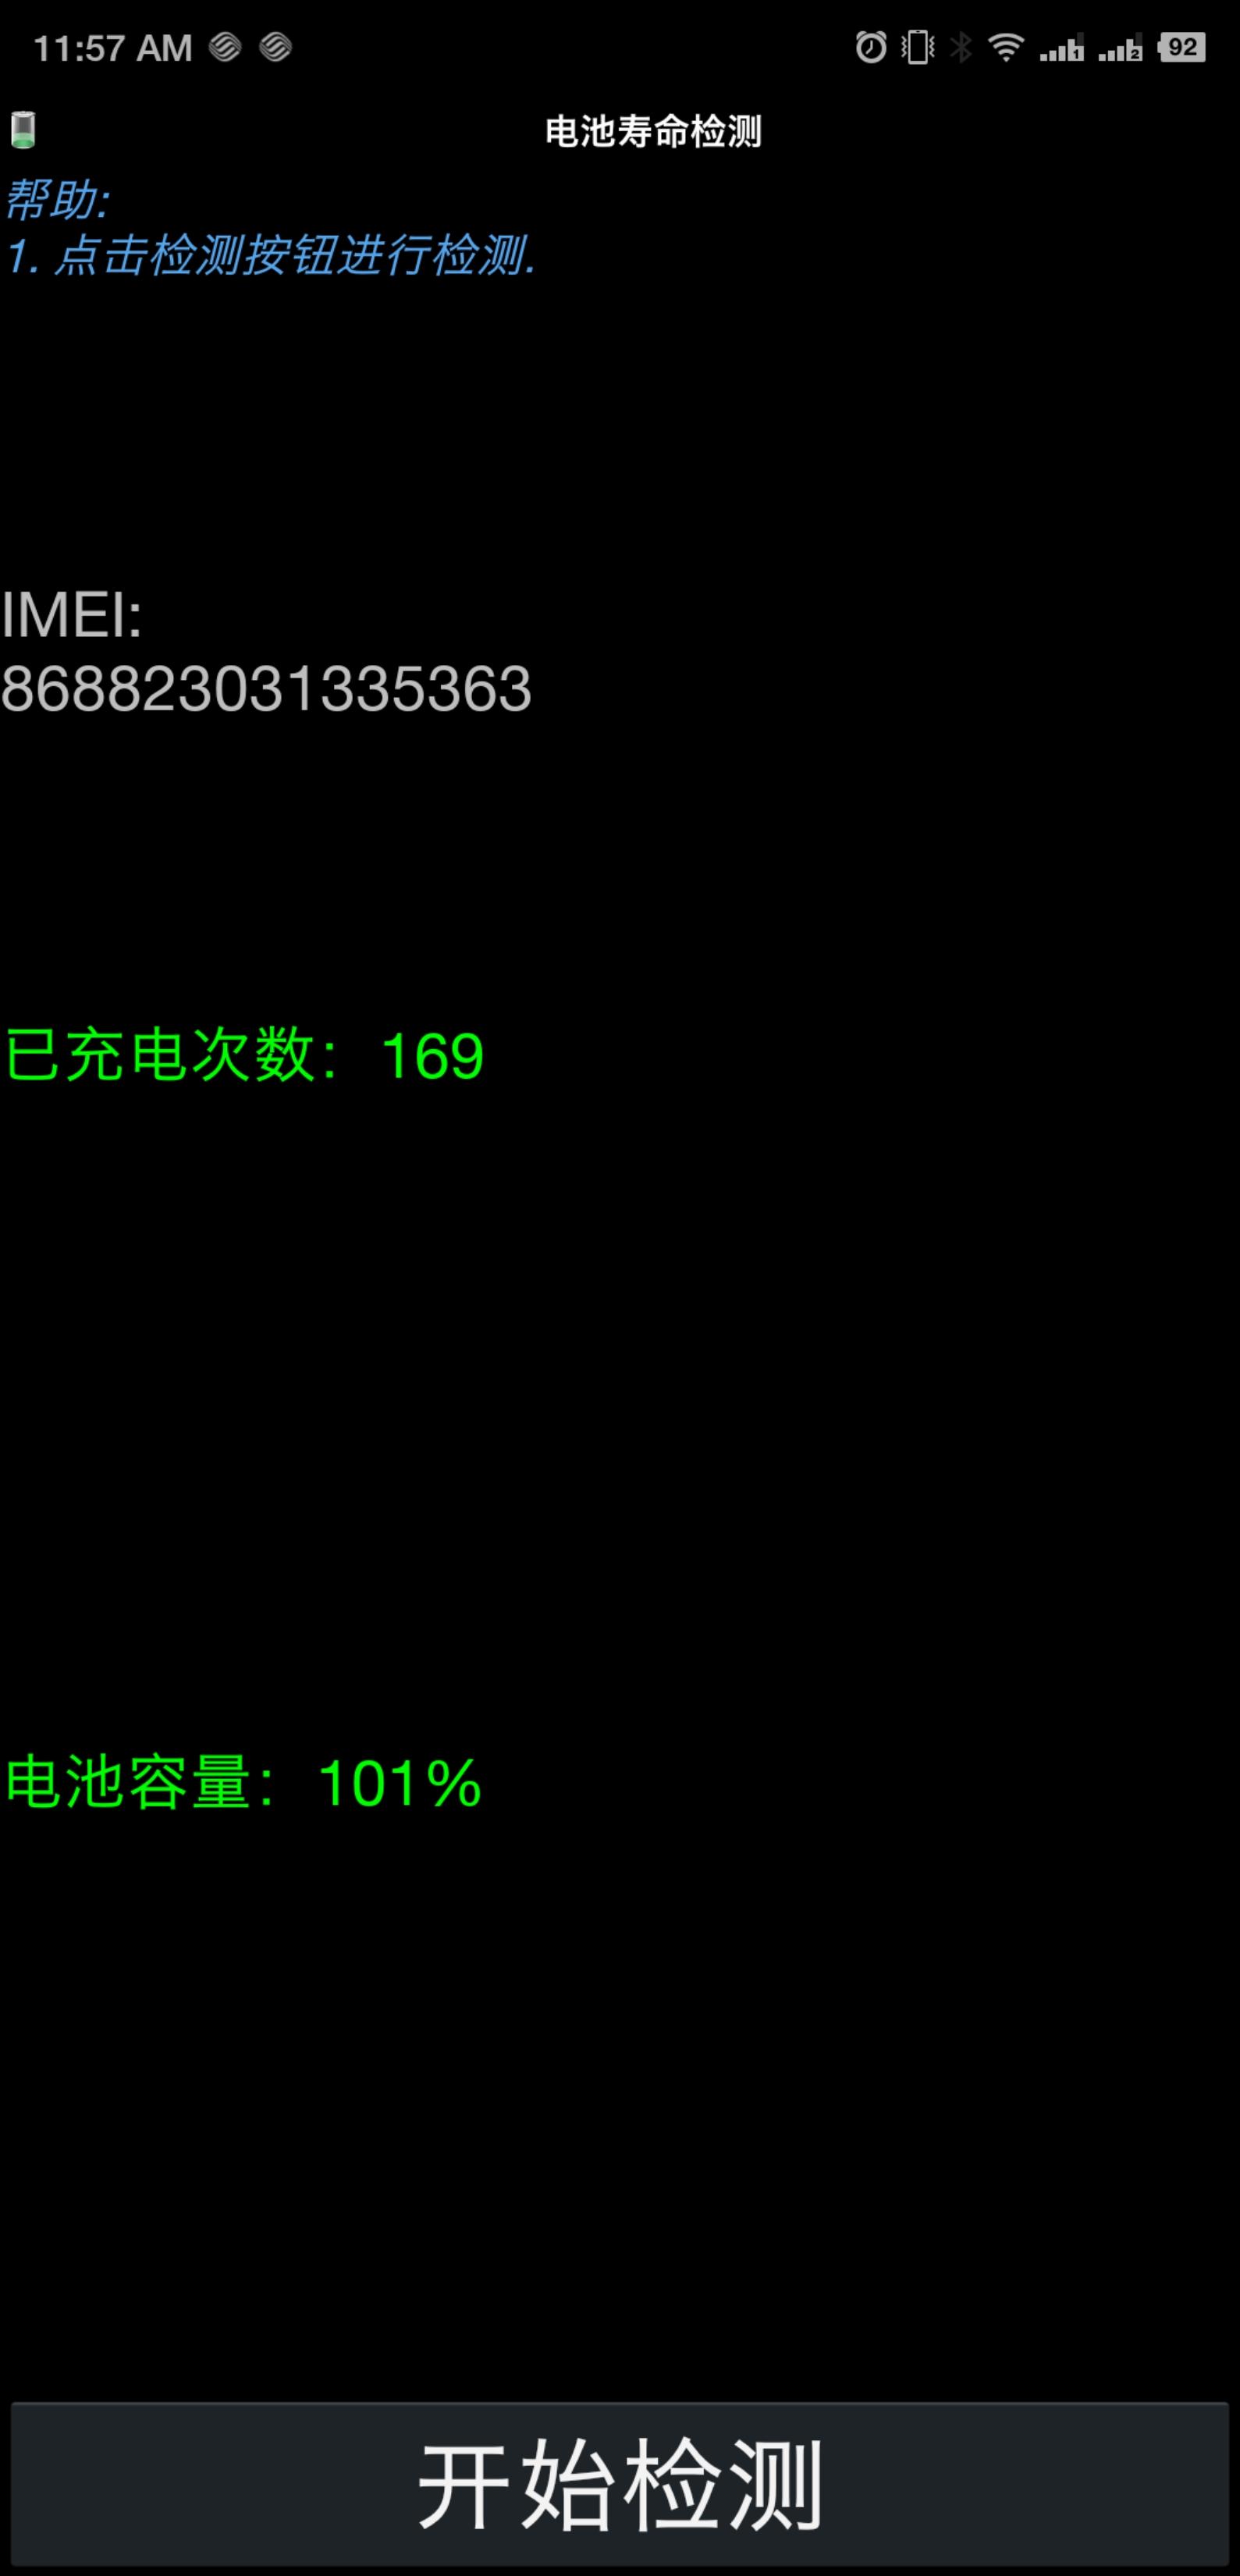 Screenshot_2018-10-26-11-57-14-057.png